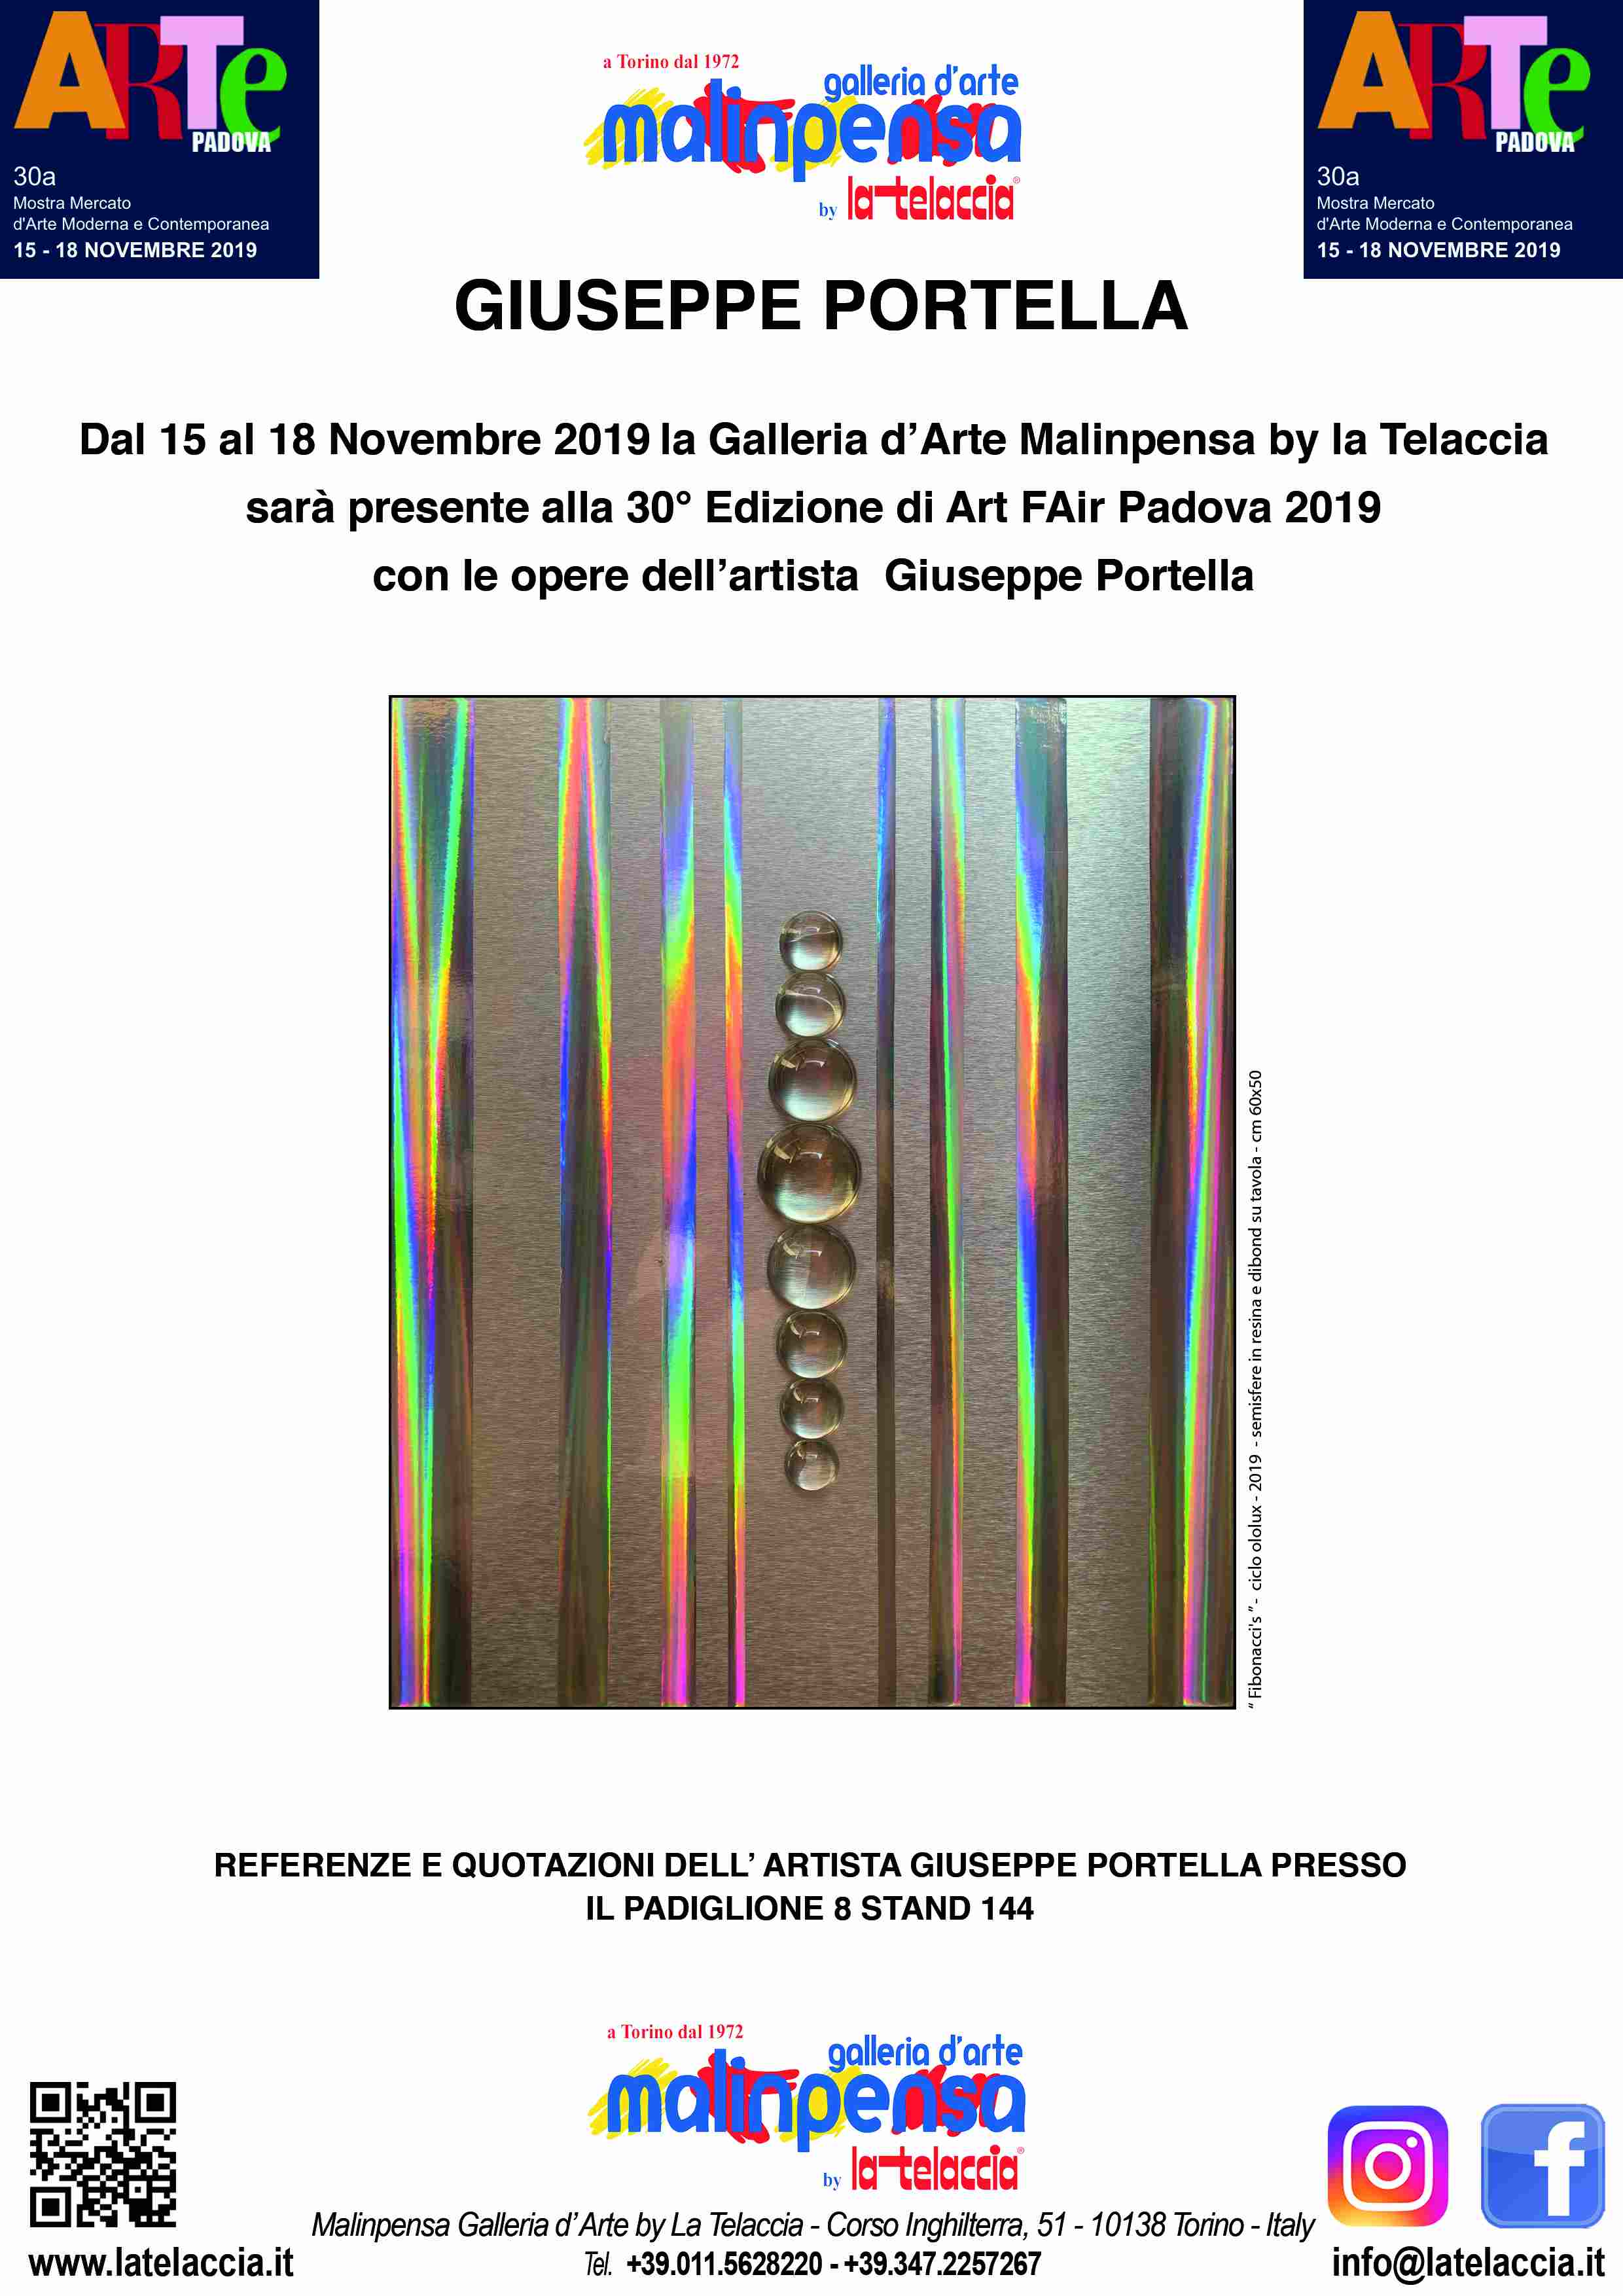 GIUSEPPE_PORTELLA_art&art_padova.jpg